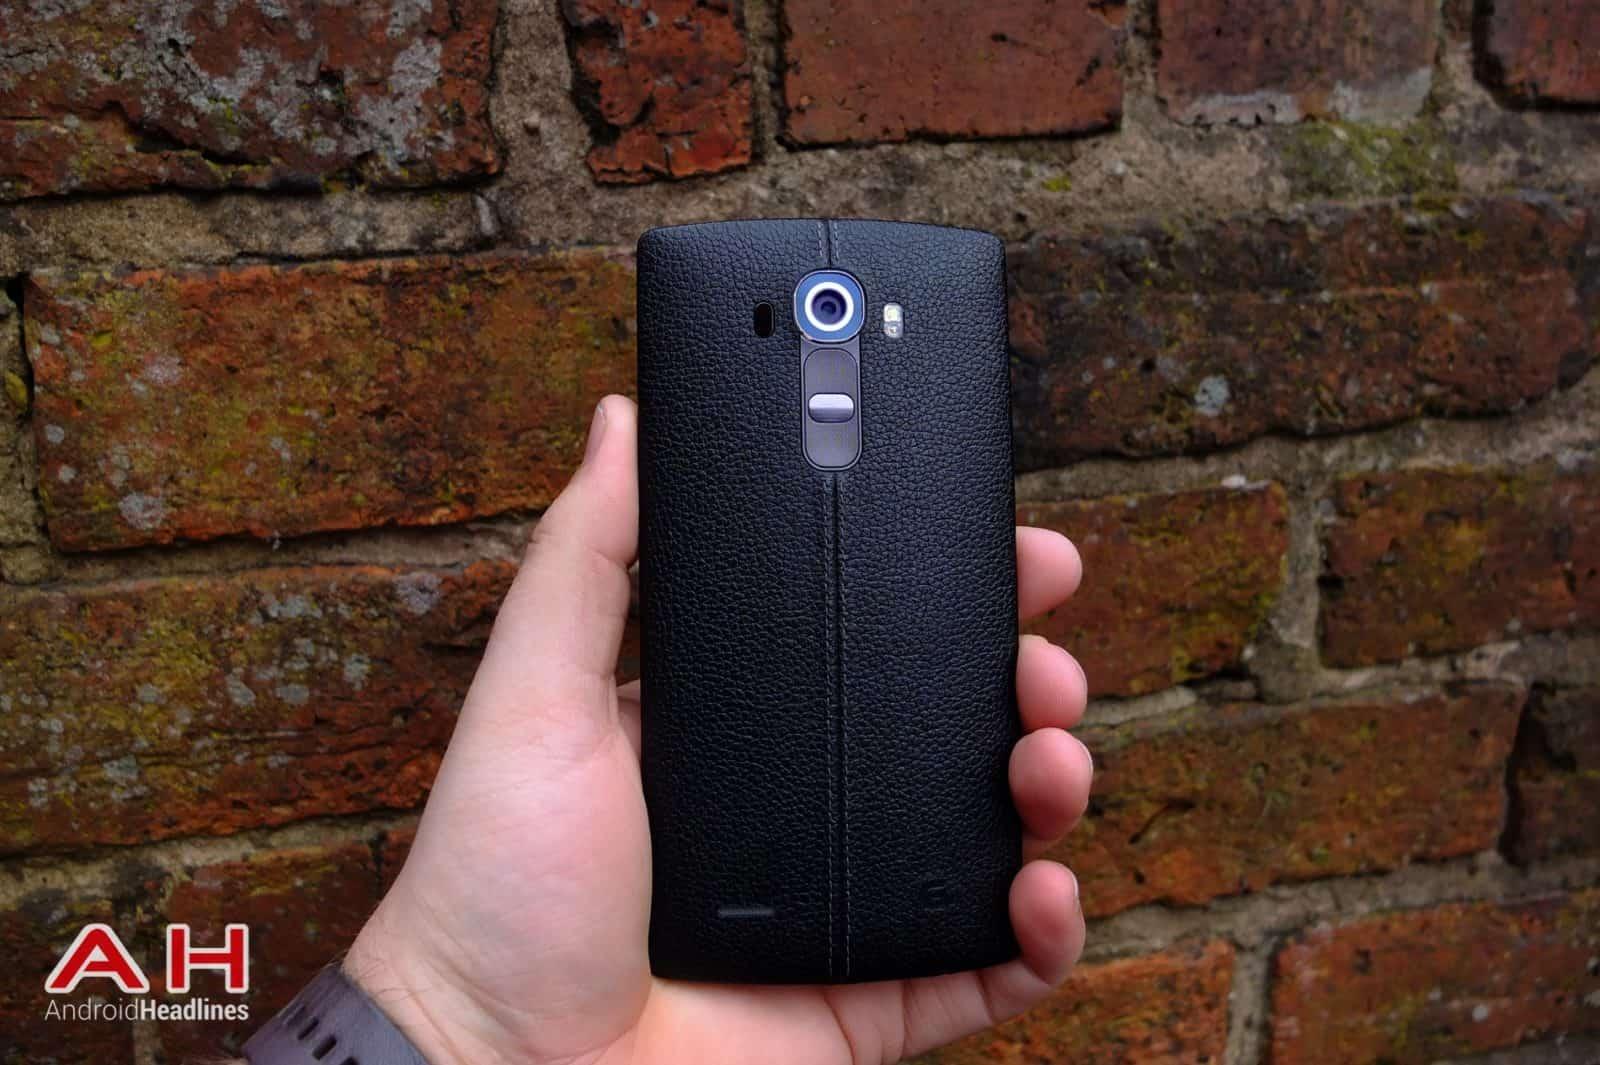 LG G4 BlackLeather TD AH 18